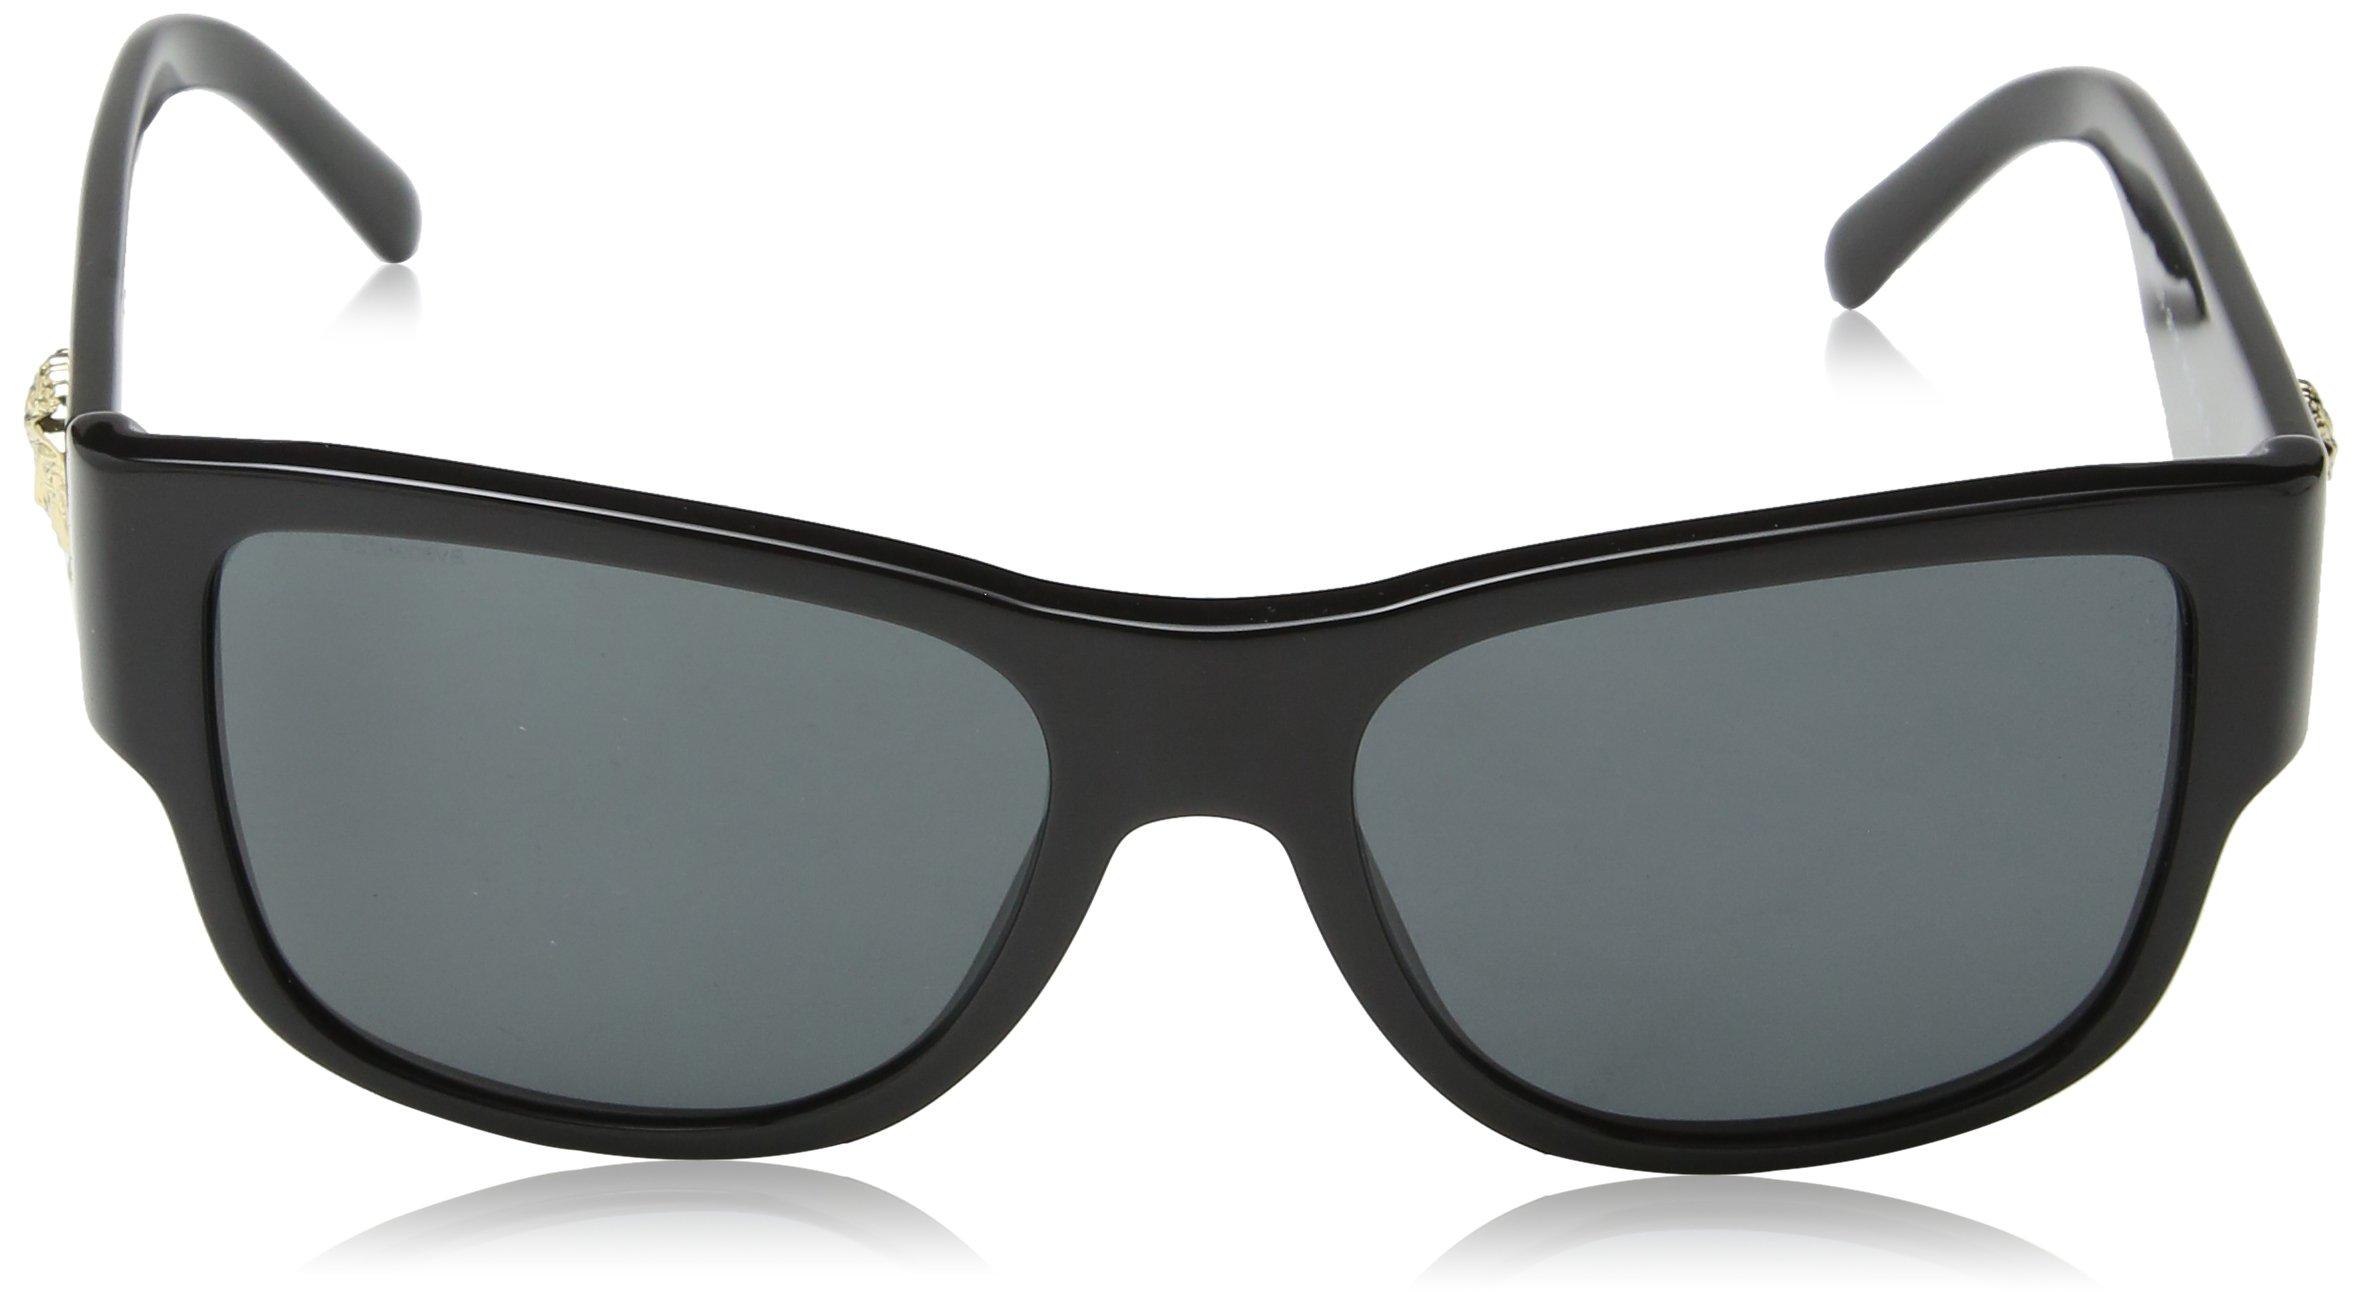 9ea5404caa6 Versace sunglasses VE4275 GB1 87 Acetate Black - Gold Black - The ...